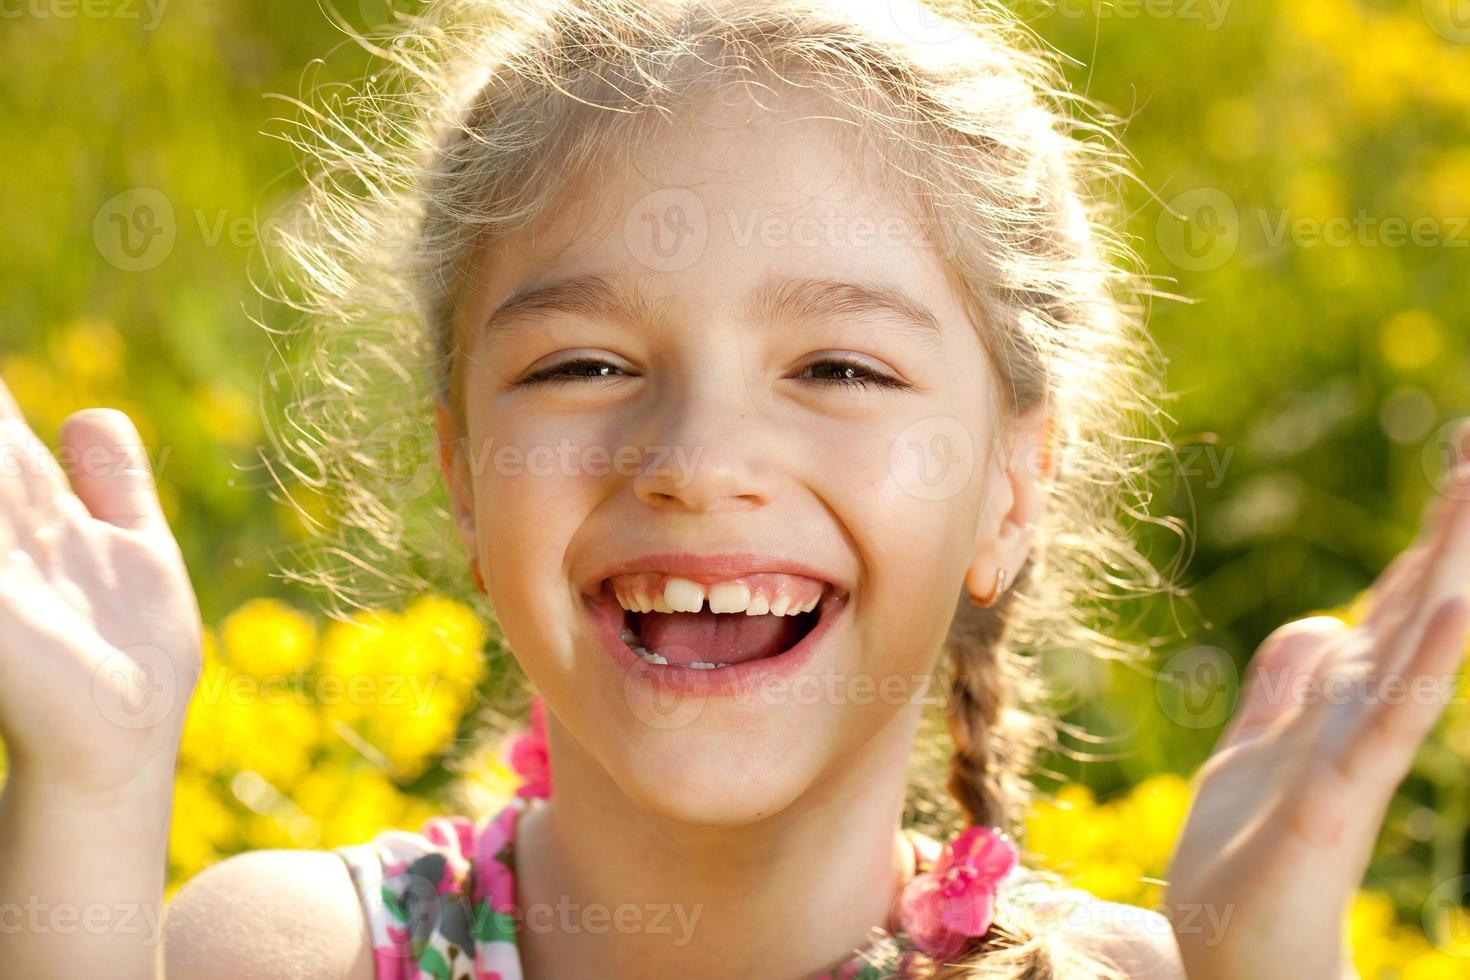 Funny little girl photo